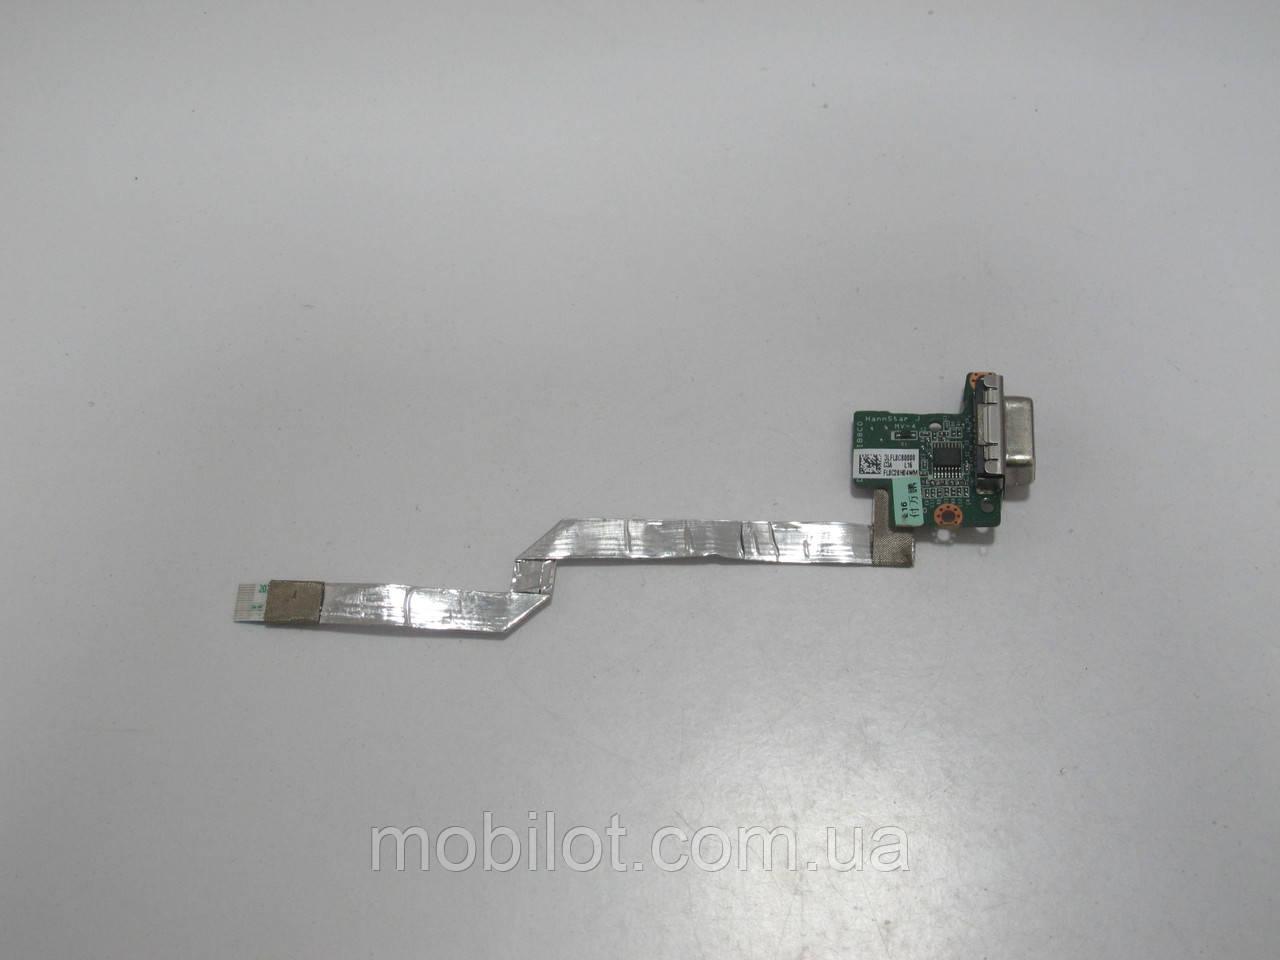 Дополнительная плата Lenovo X121e (NZ-5344)